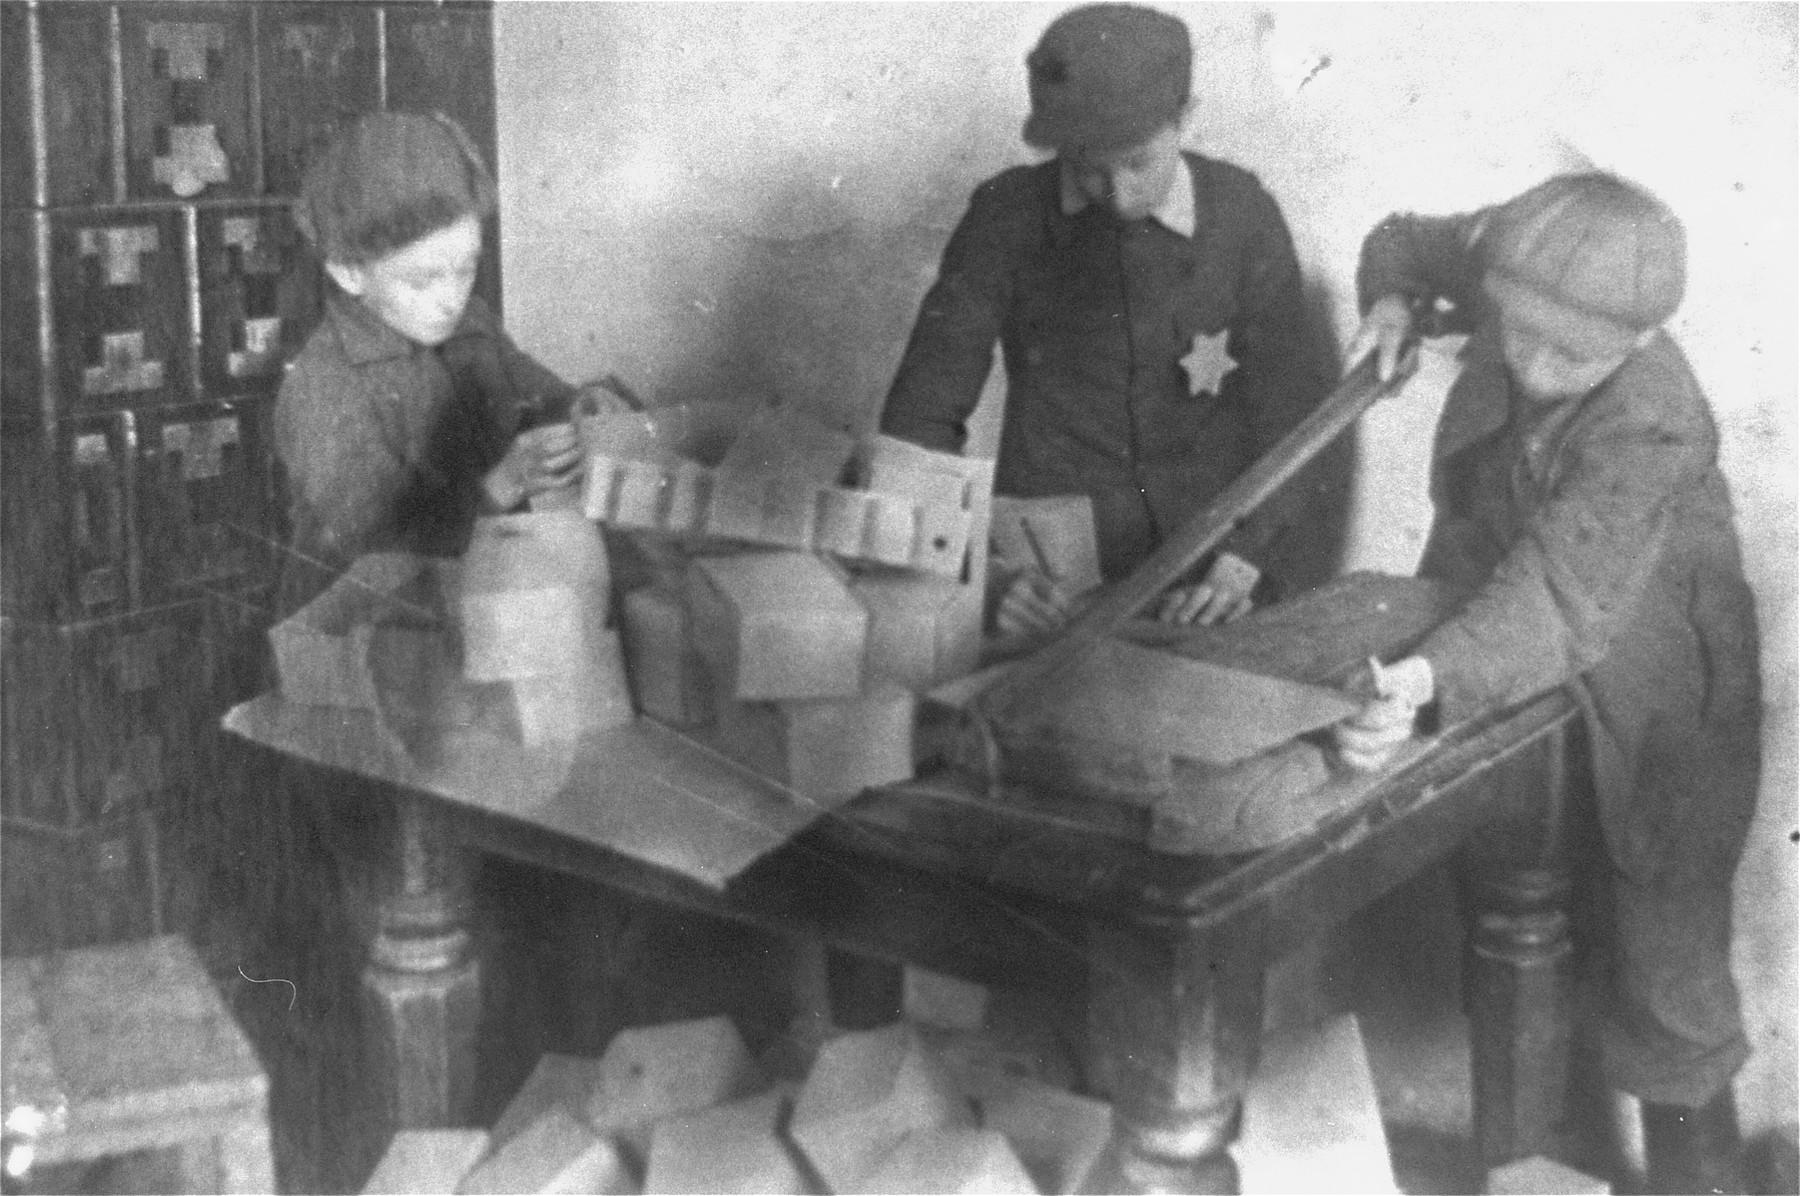 Jewish children making boxes in the Glubokoye ghetto.